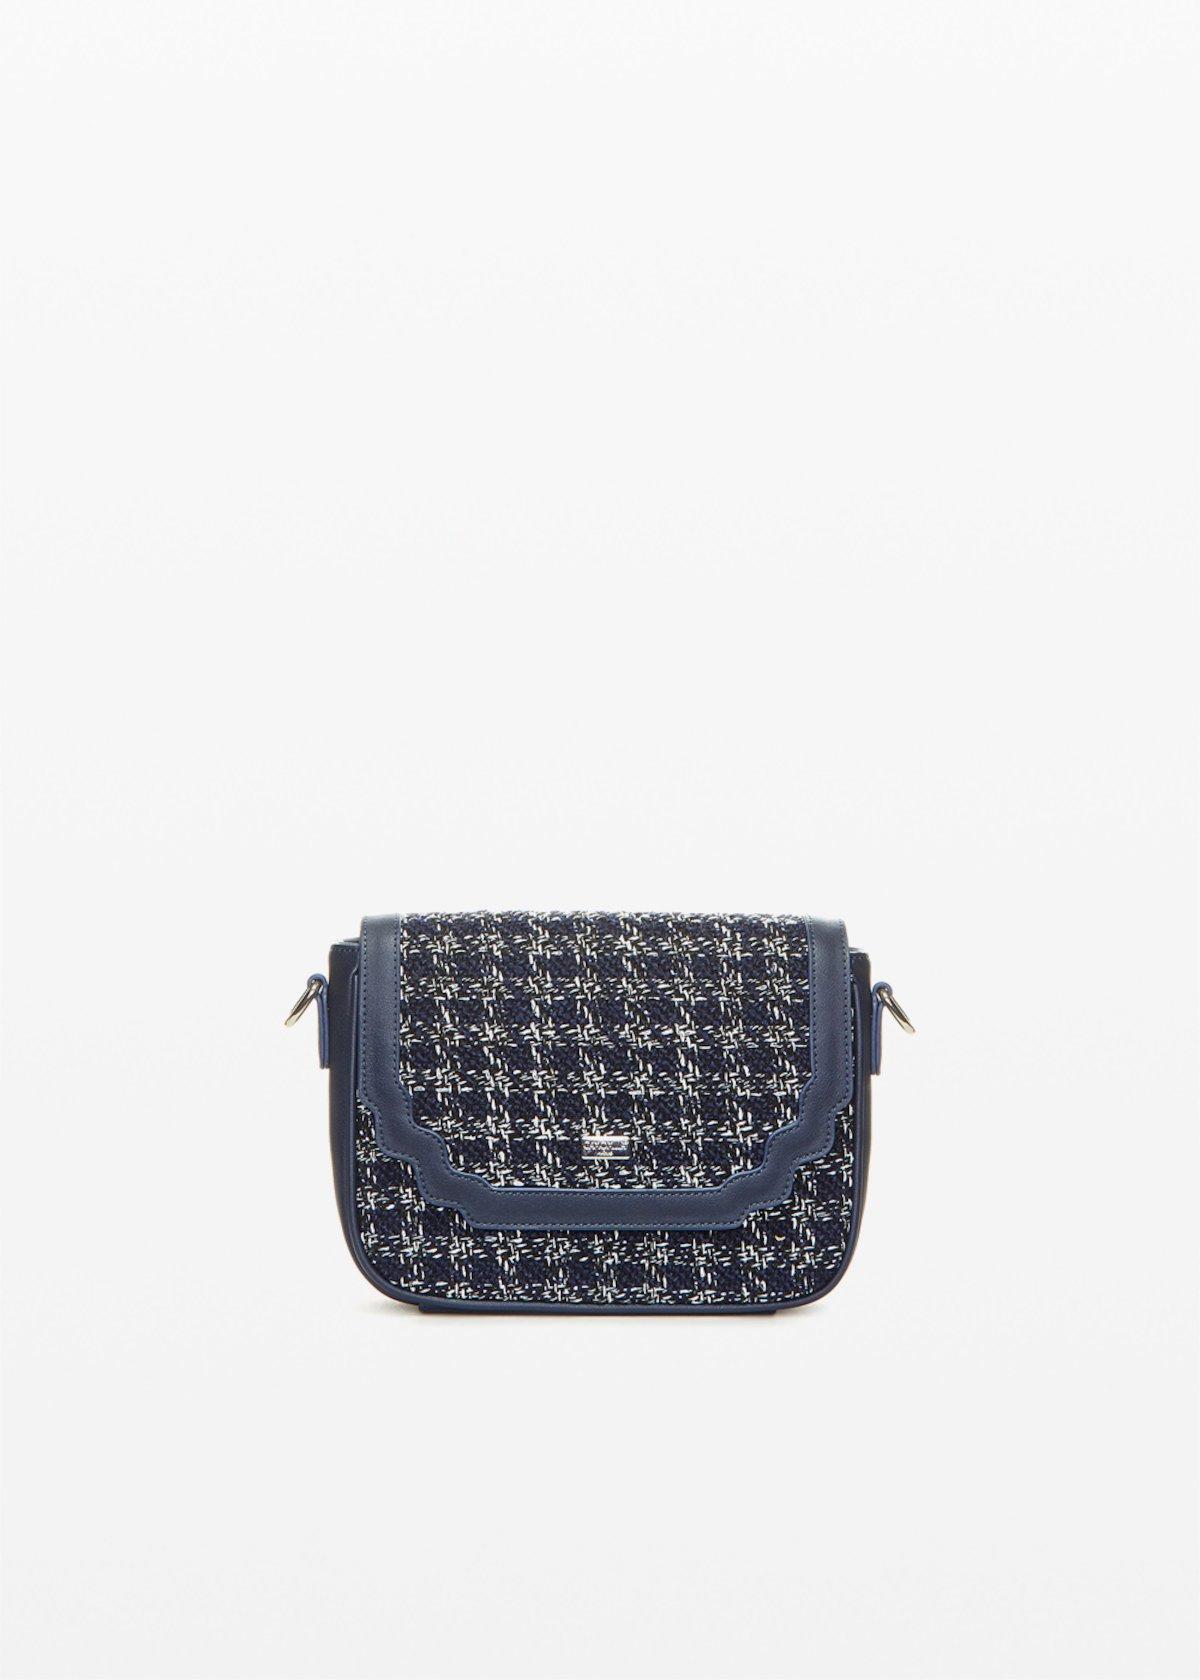 Crossbody bag Bita in ecopelle boucle' effect - Blue / White Fantasia - Donna